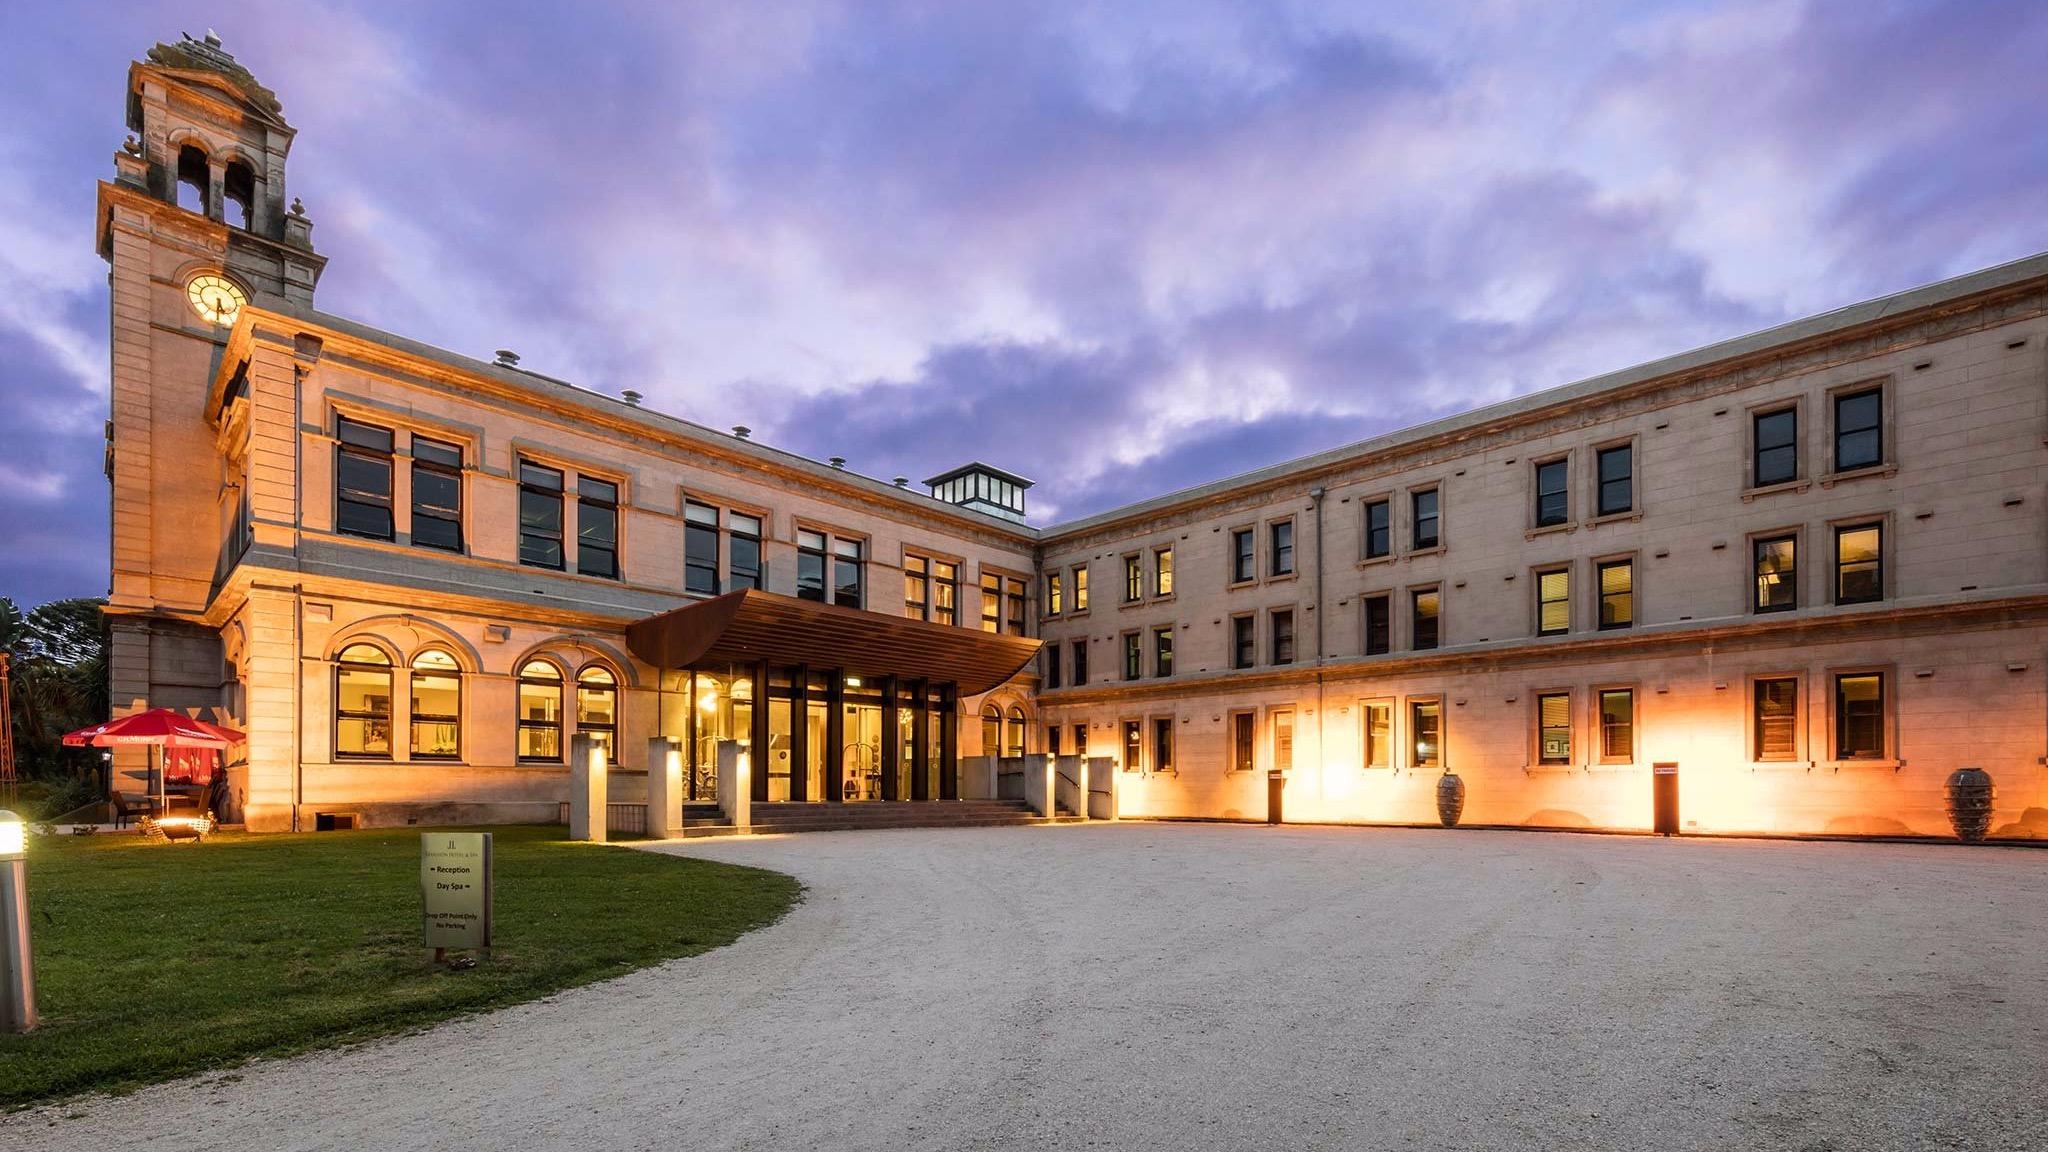 Mansion Hotel & Spa